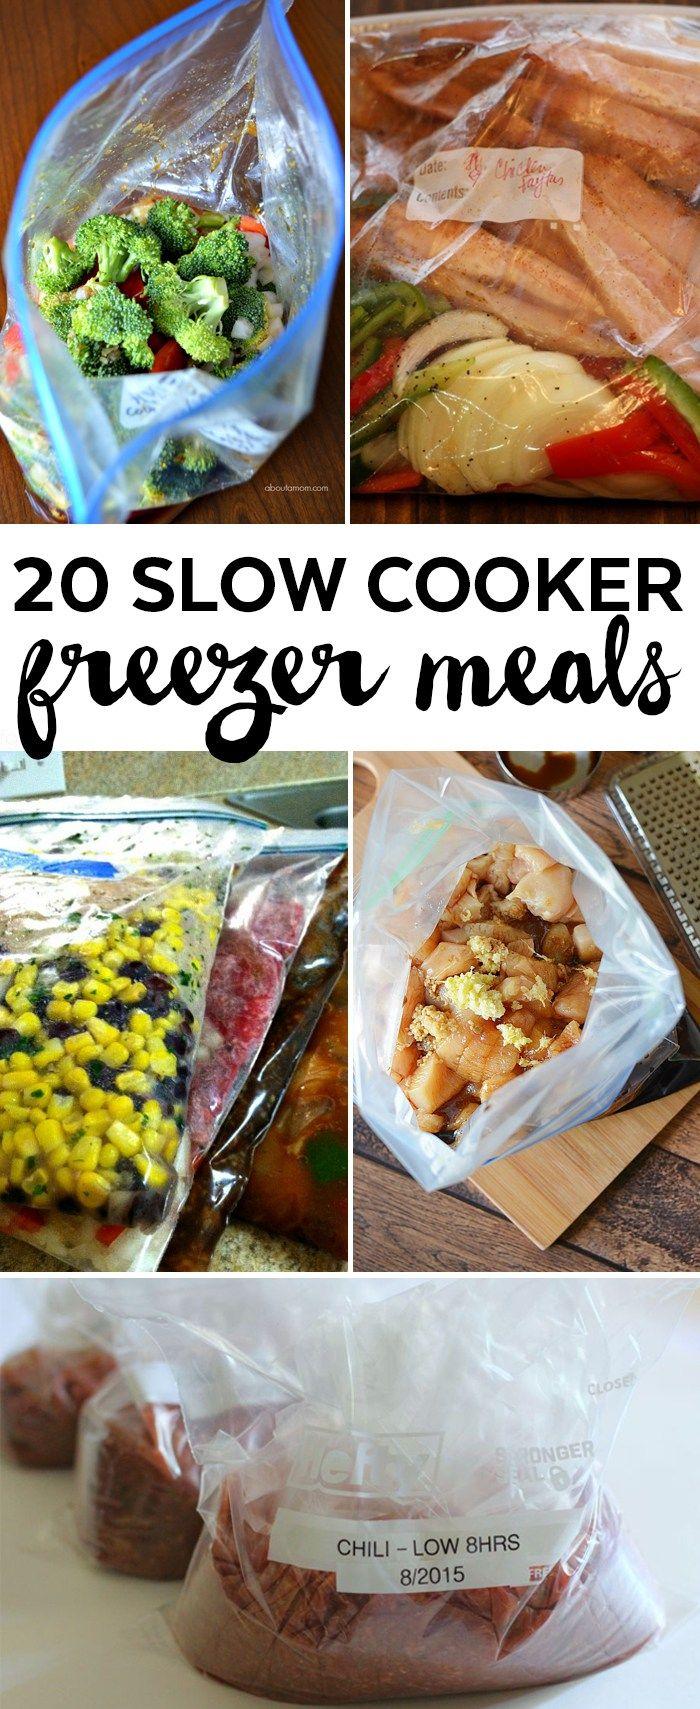 Slow Cooker Freezer Meals for New Moms   Freezer Crockpot Meals   Make Ahead Meals Slow Cooker Recipes   Freezer Cooking Recipes   Make Ahead Freezer Meals   Crock Pot Freezer Meals